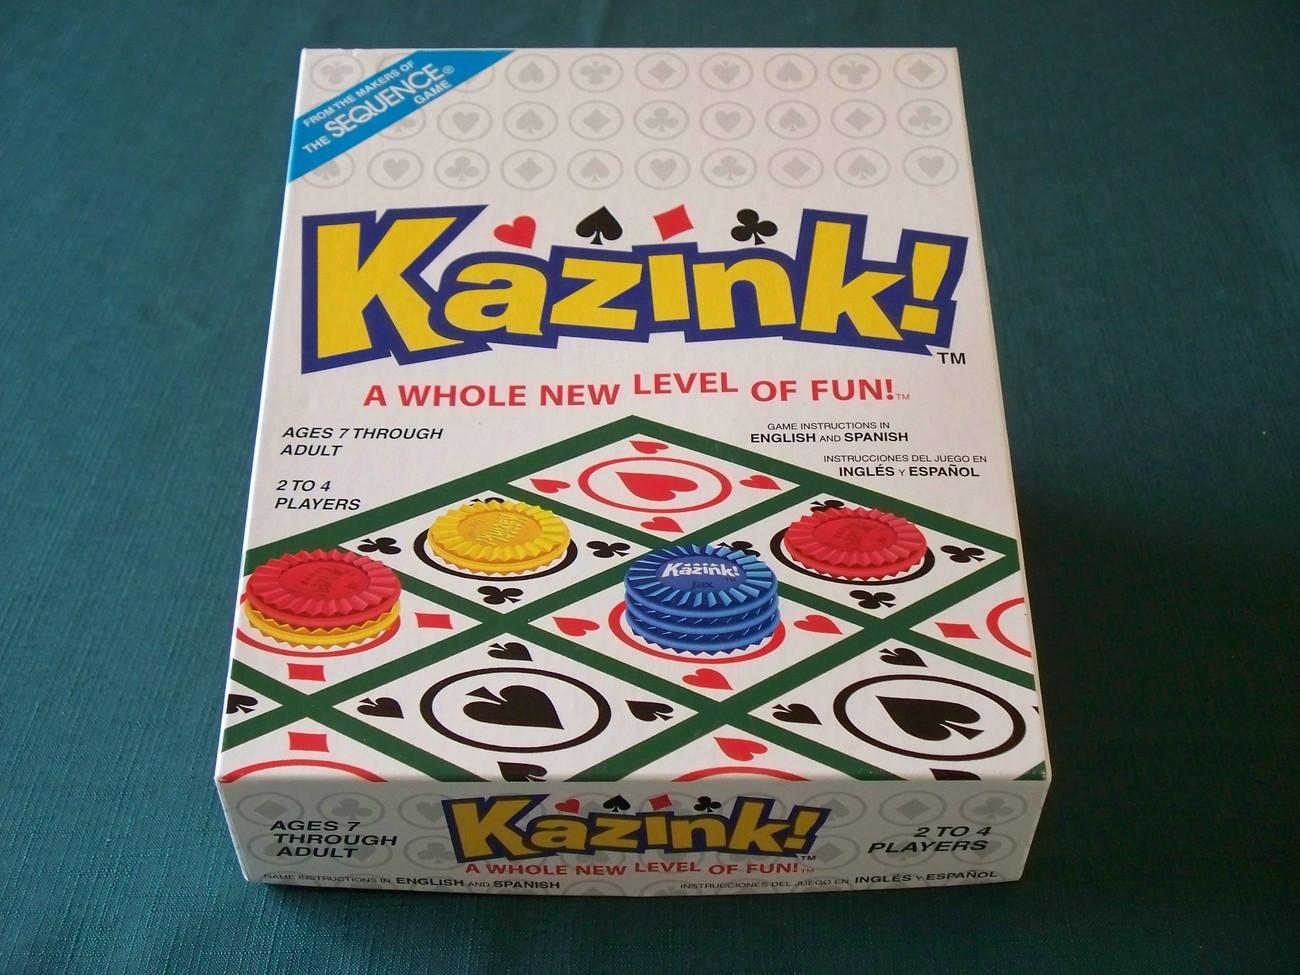 Kazink! by Jax Ltd, 2004. Complete VGC - $8.75